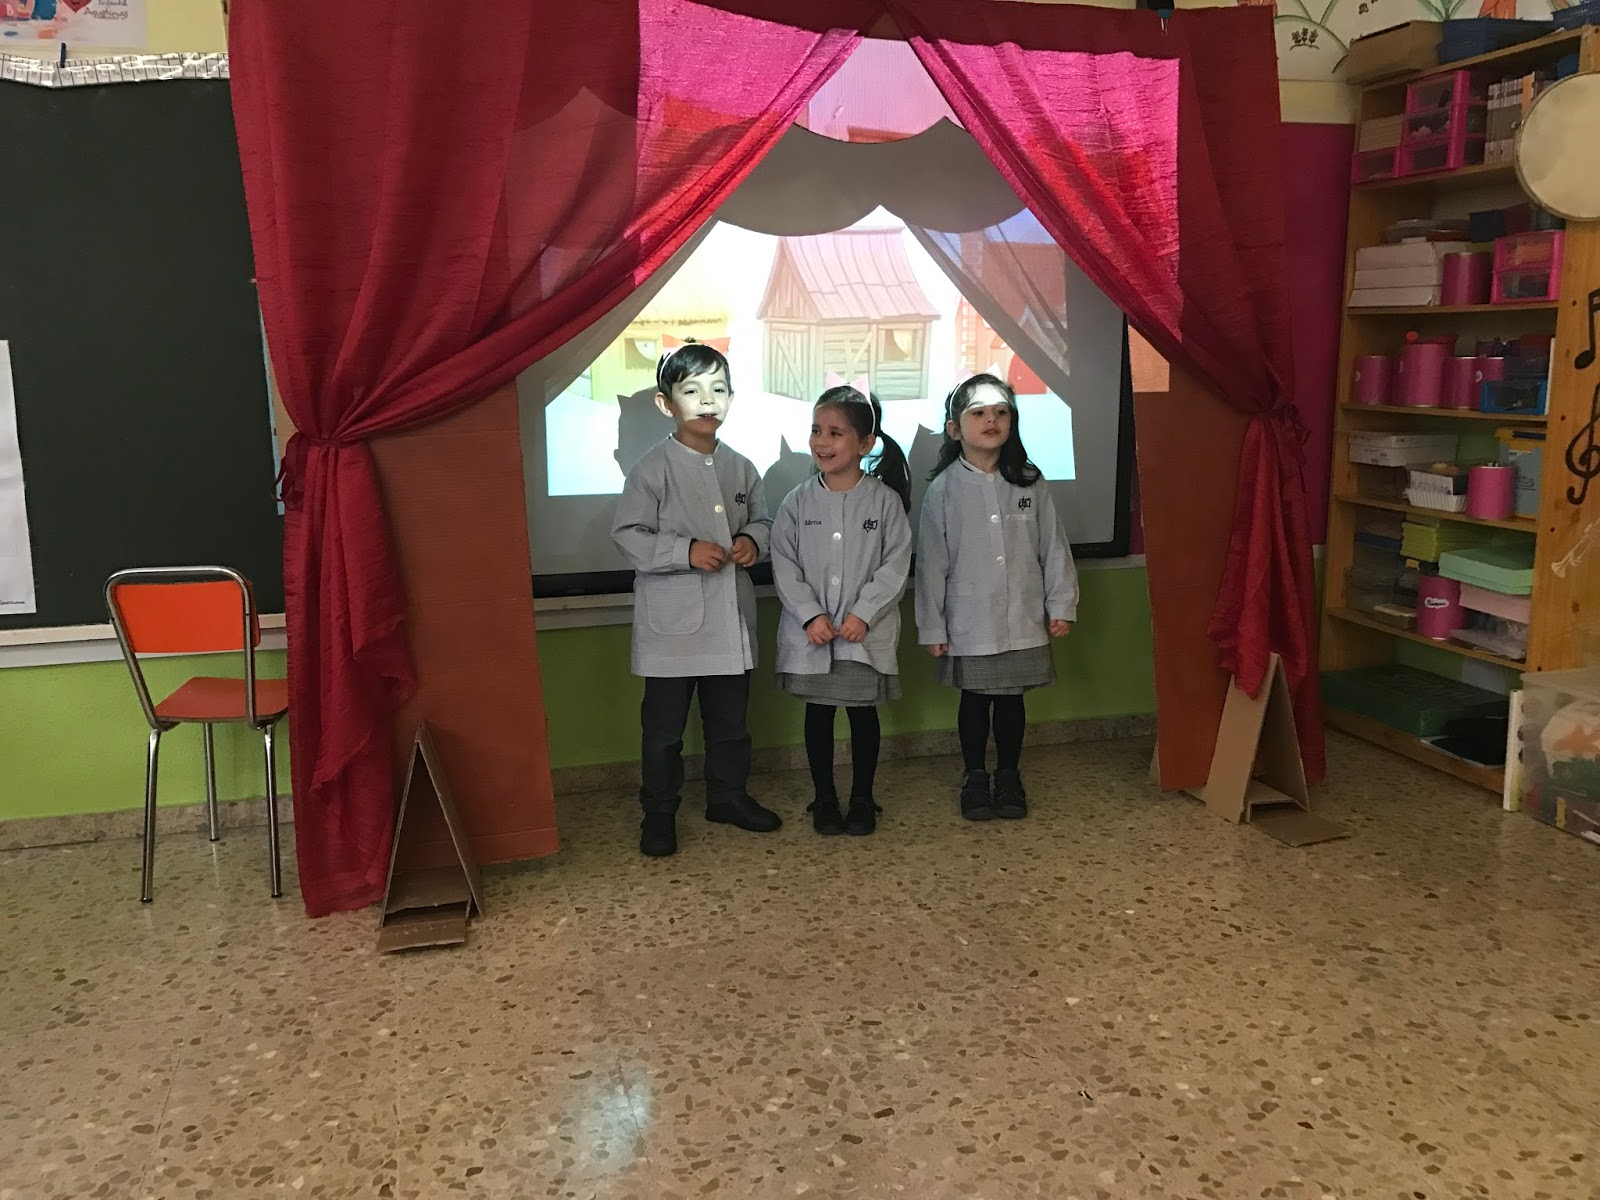 Agustinas Valladolid - 2017 - Infantil 4 - Teatro 1